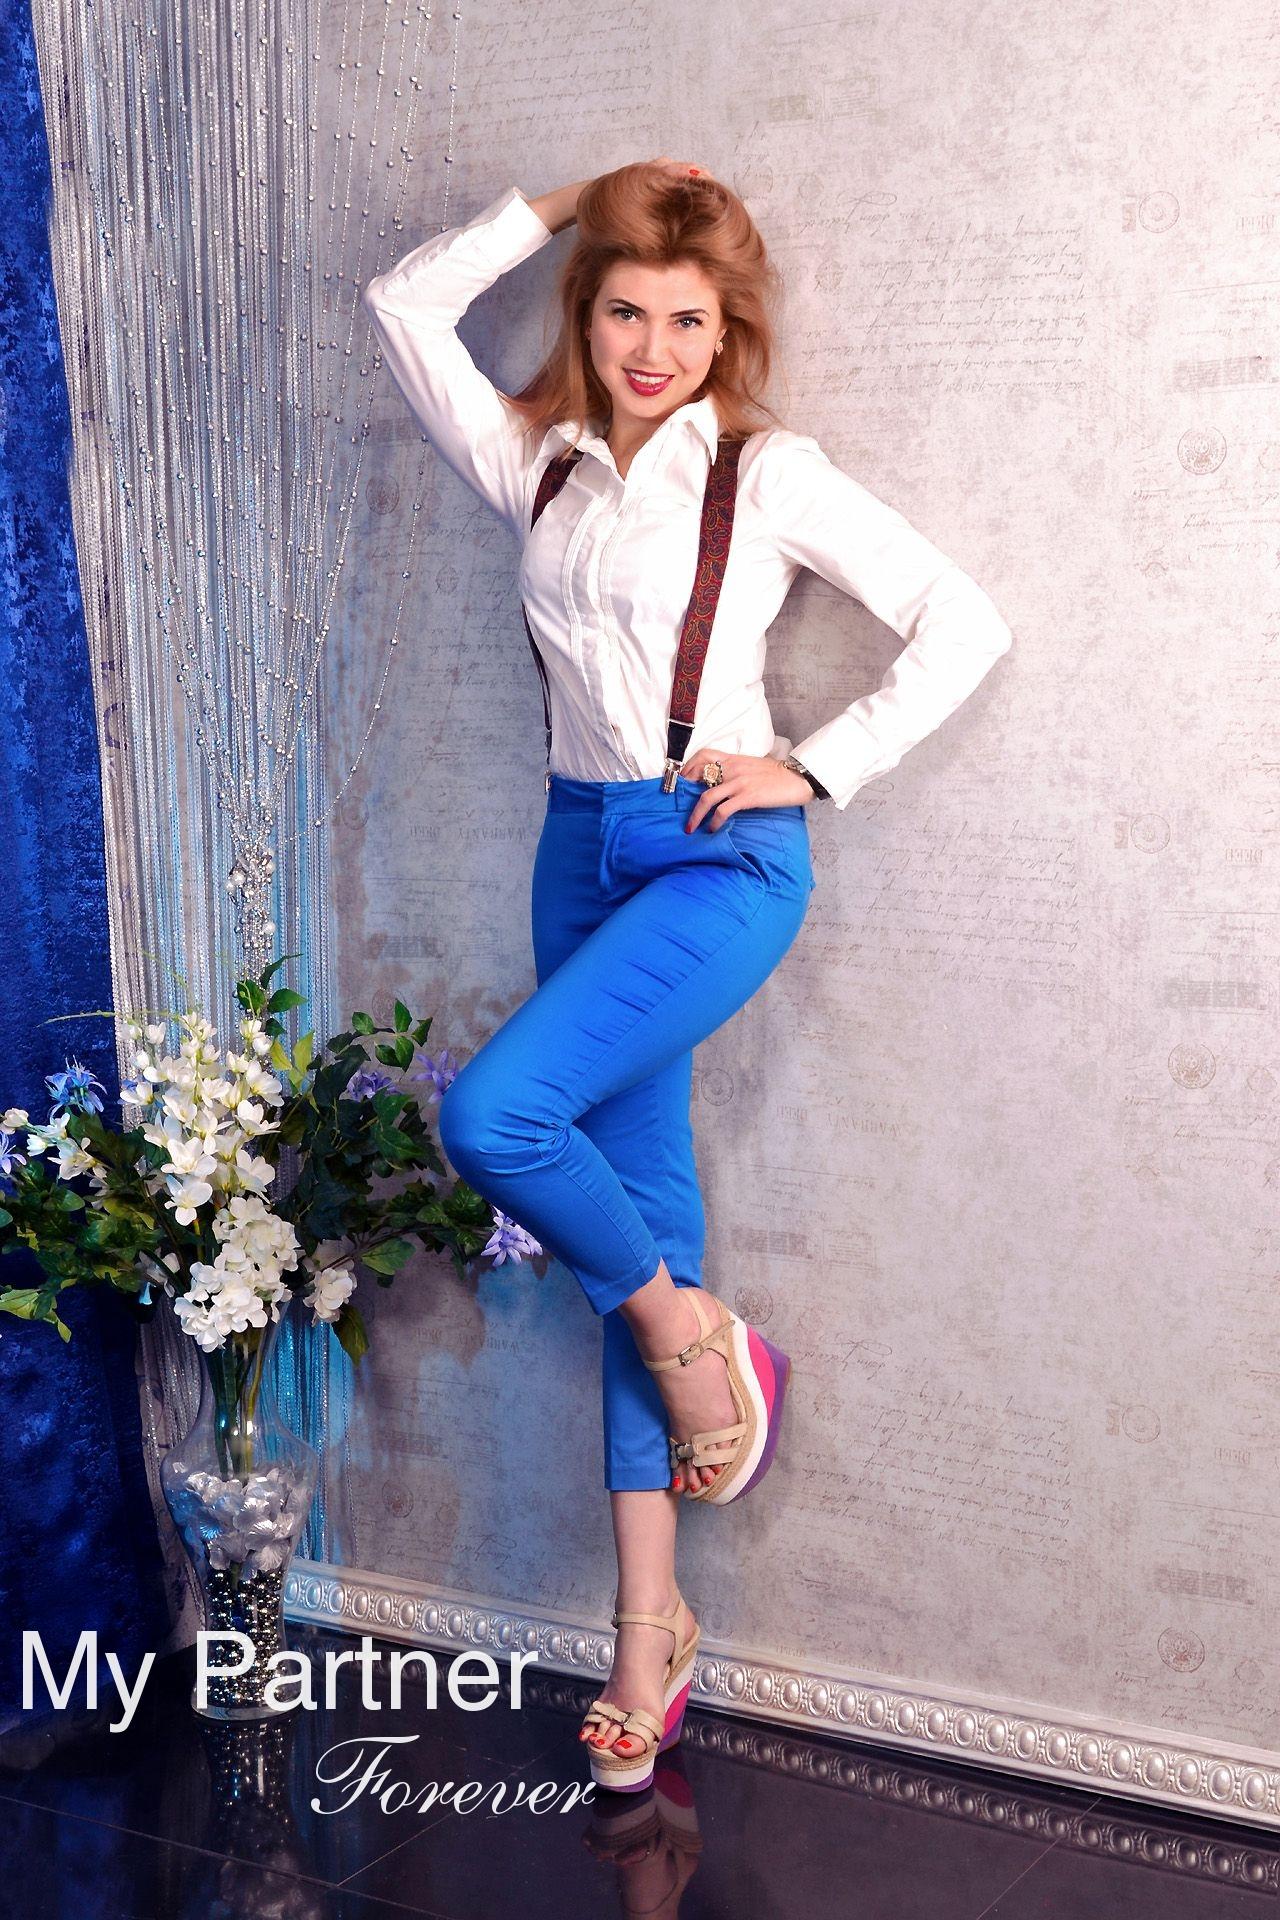 Dating Site to Meet Pretty Ukrainian Woman Alina from Kharkov, Ukraine